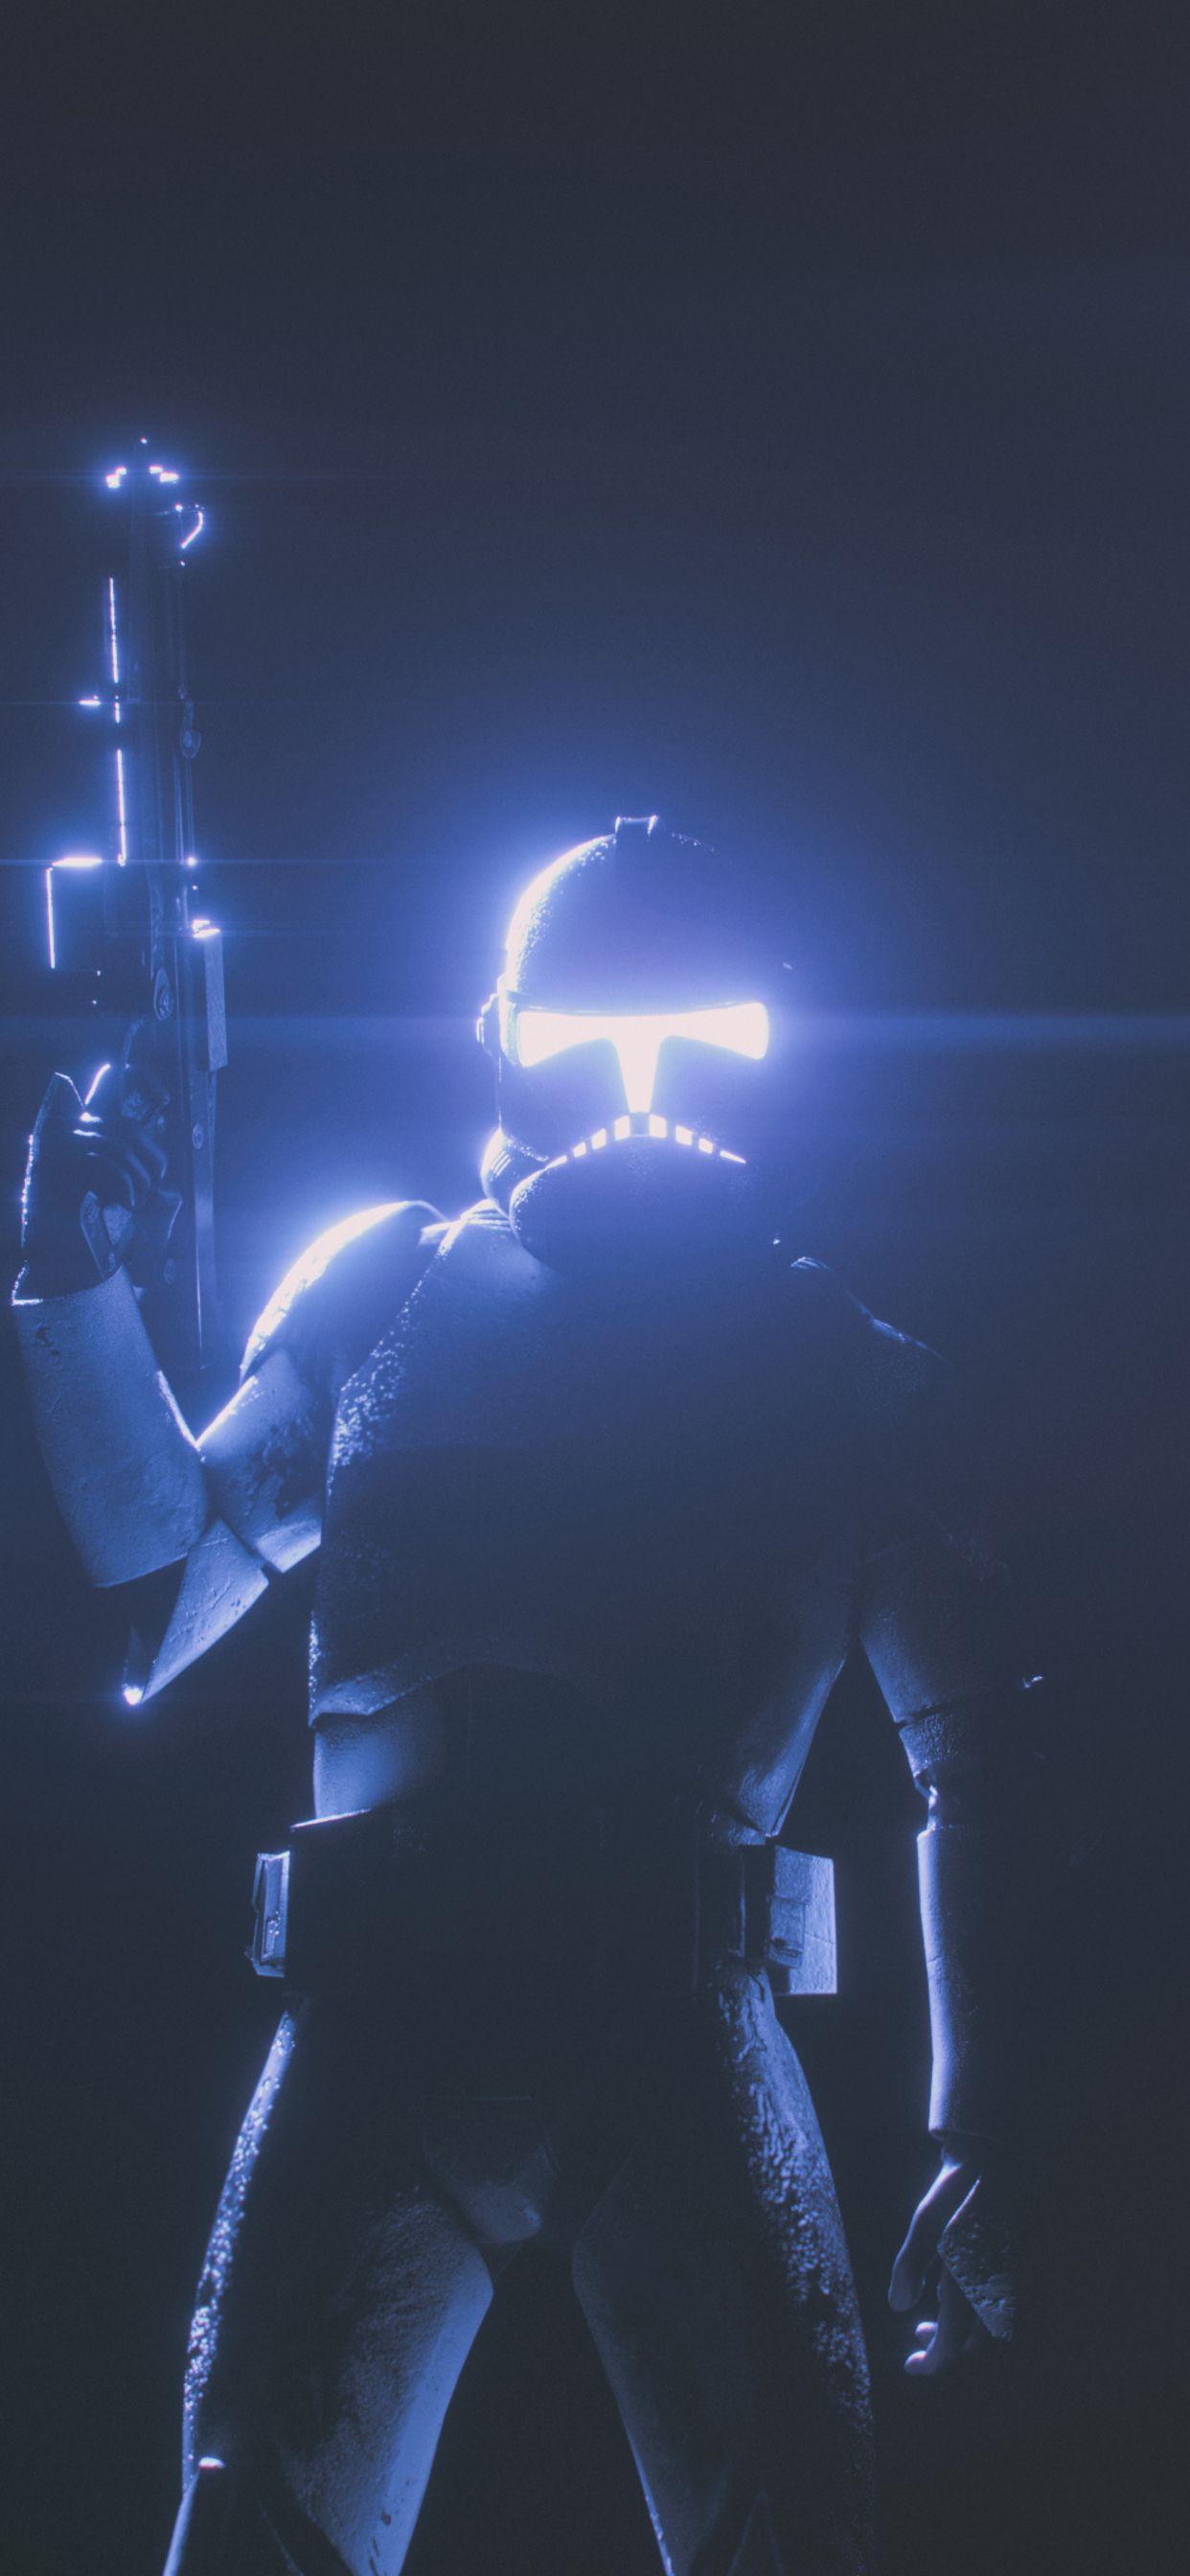 Fondos De Pantalla De Star Wars Fondosmil